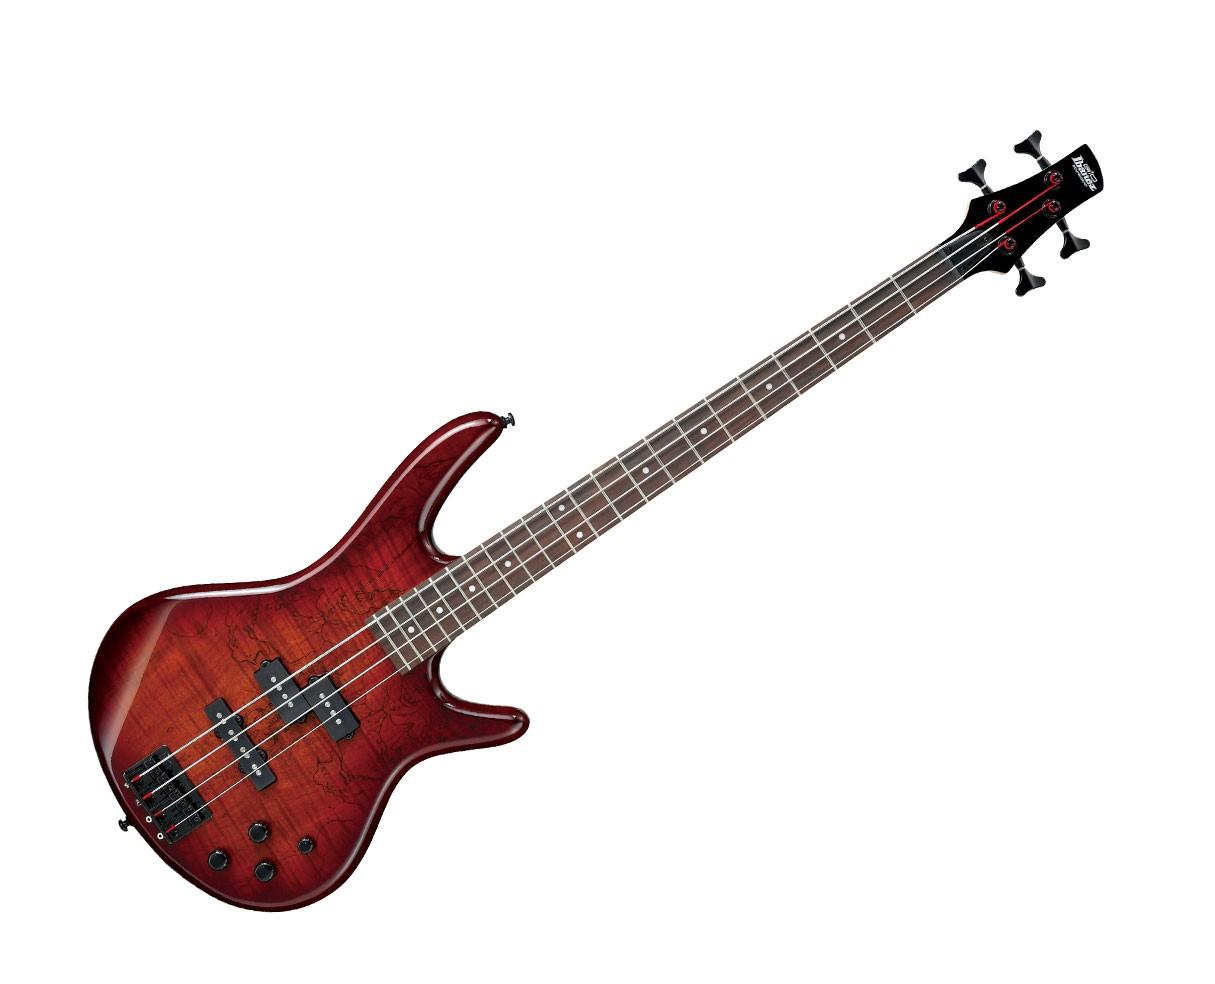 Ibanez GSR200SM Electric Bass Guitar - Charcoal Brown Burst